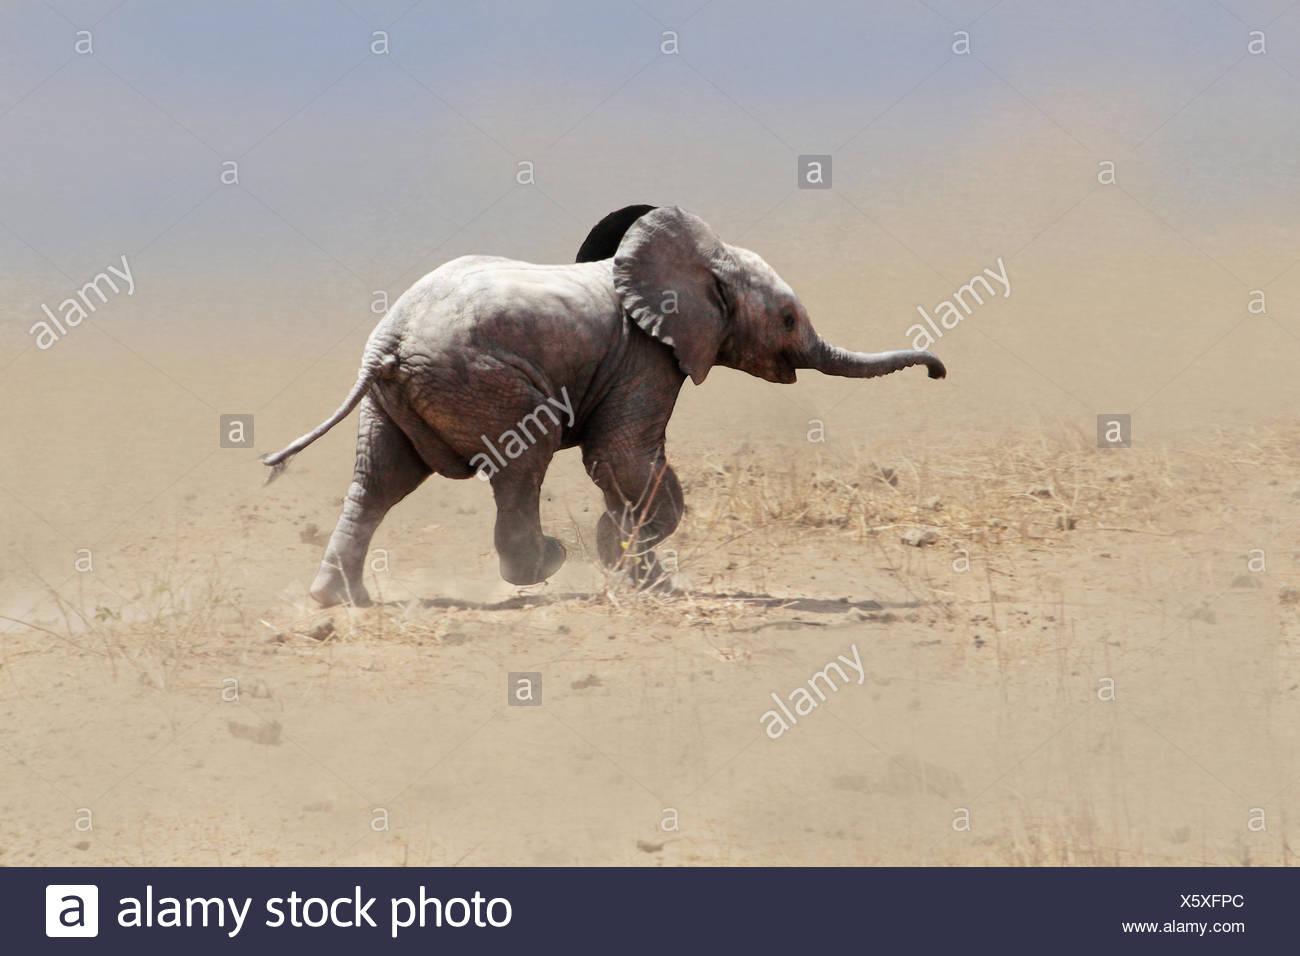 Elefante africano (Loxodonta africana), baby elephant in esecuzione attraverso una tempesta di sabbia, Kenya, Amboseli National Park Immagini Stock